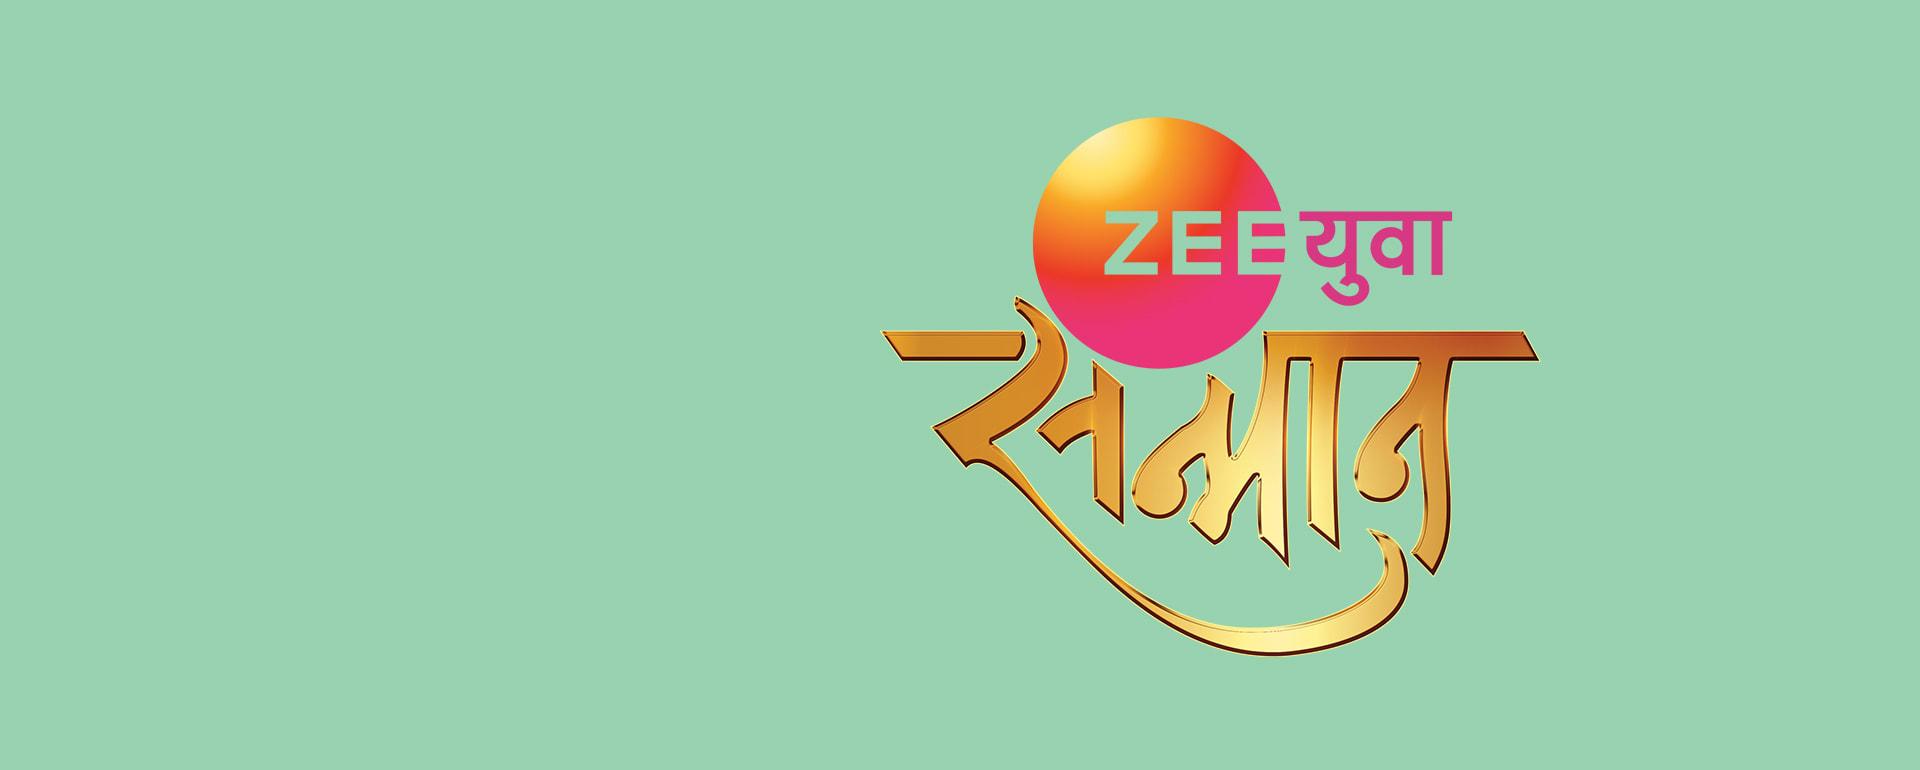 Zee Yuva Sanmaan 2019